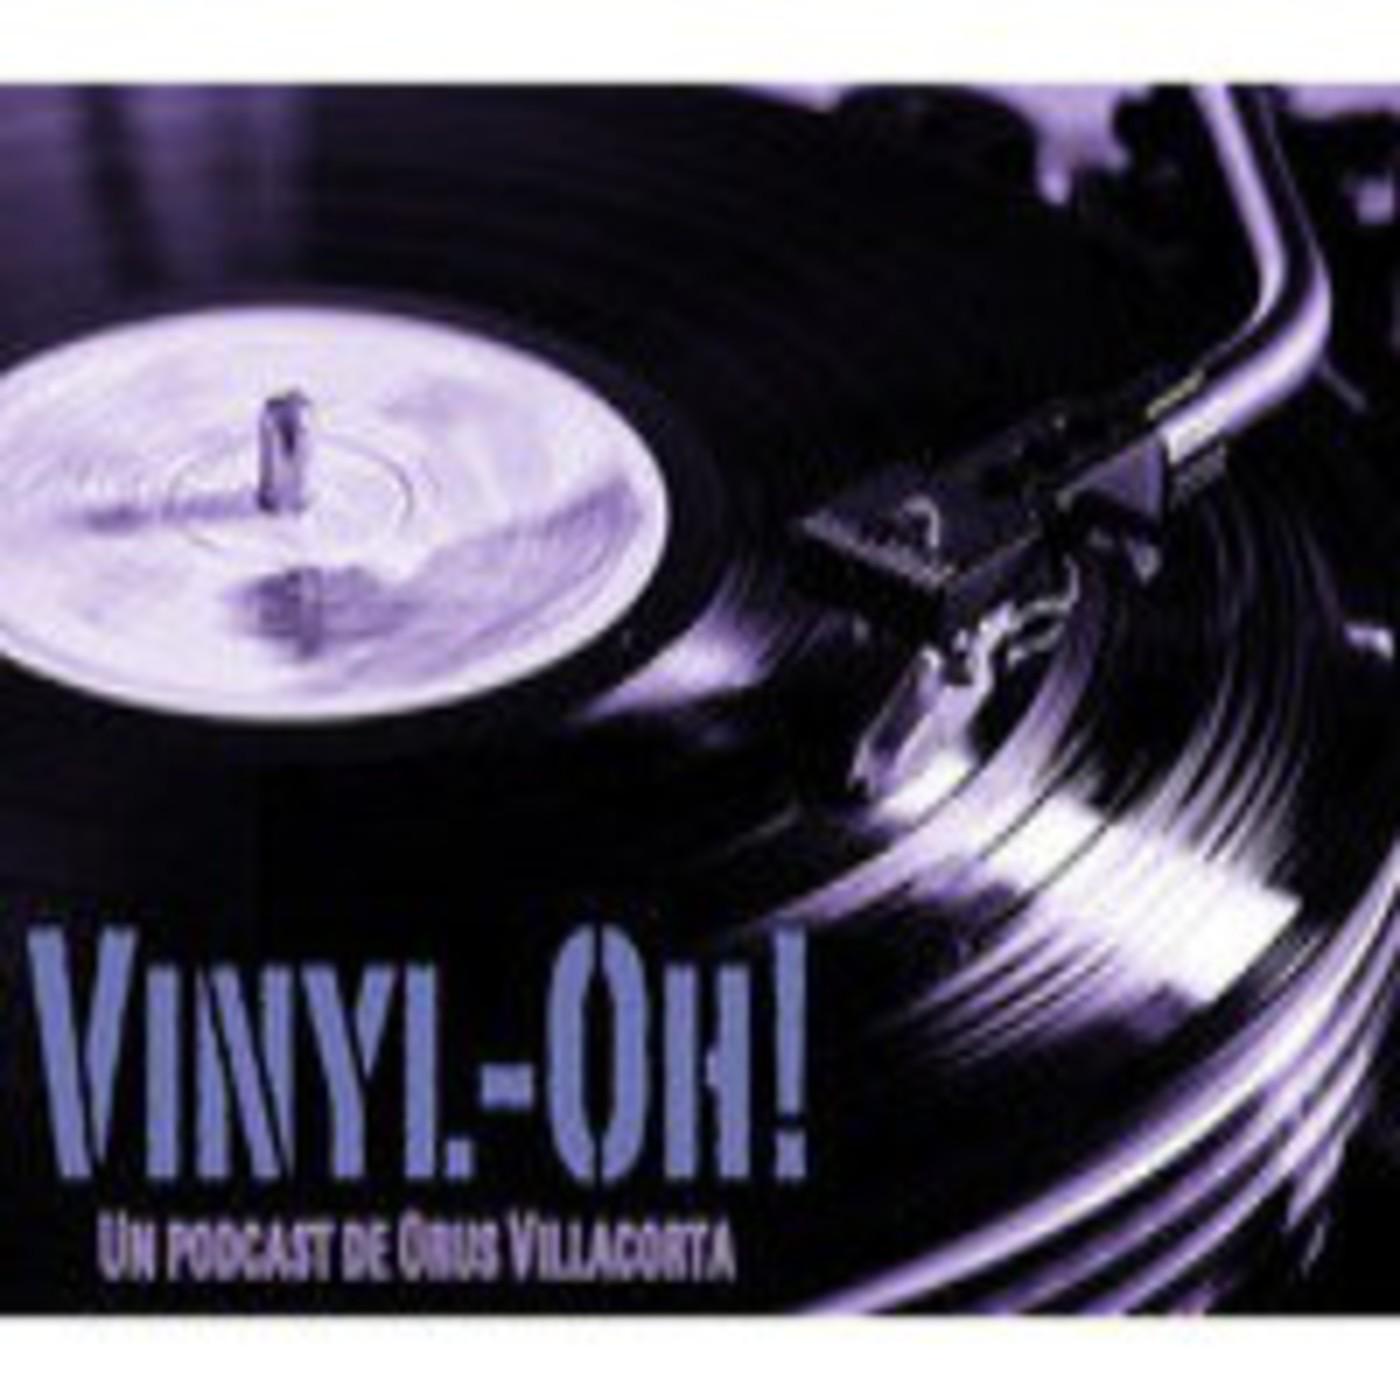 Vinyl-Oh!